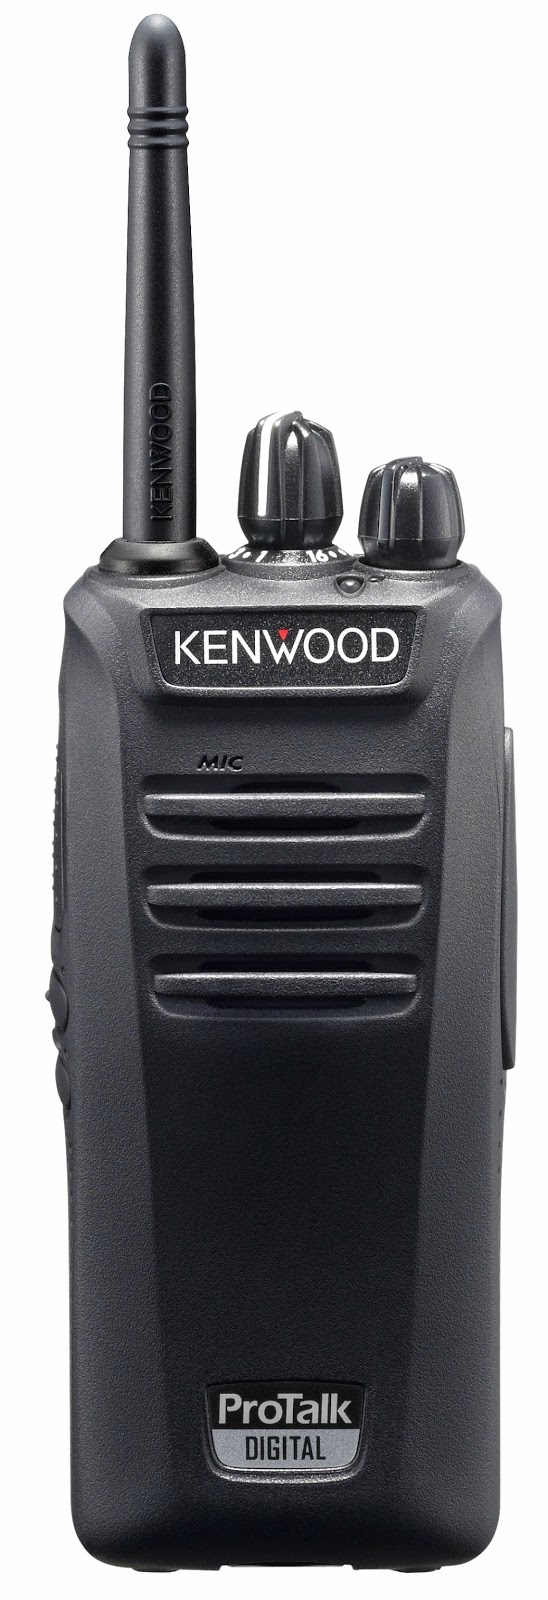 Kenwood TK-3401D dPMR446 radio